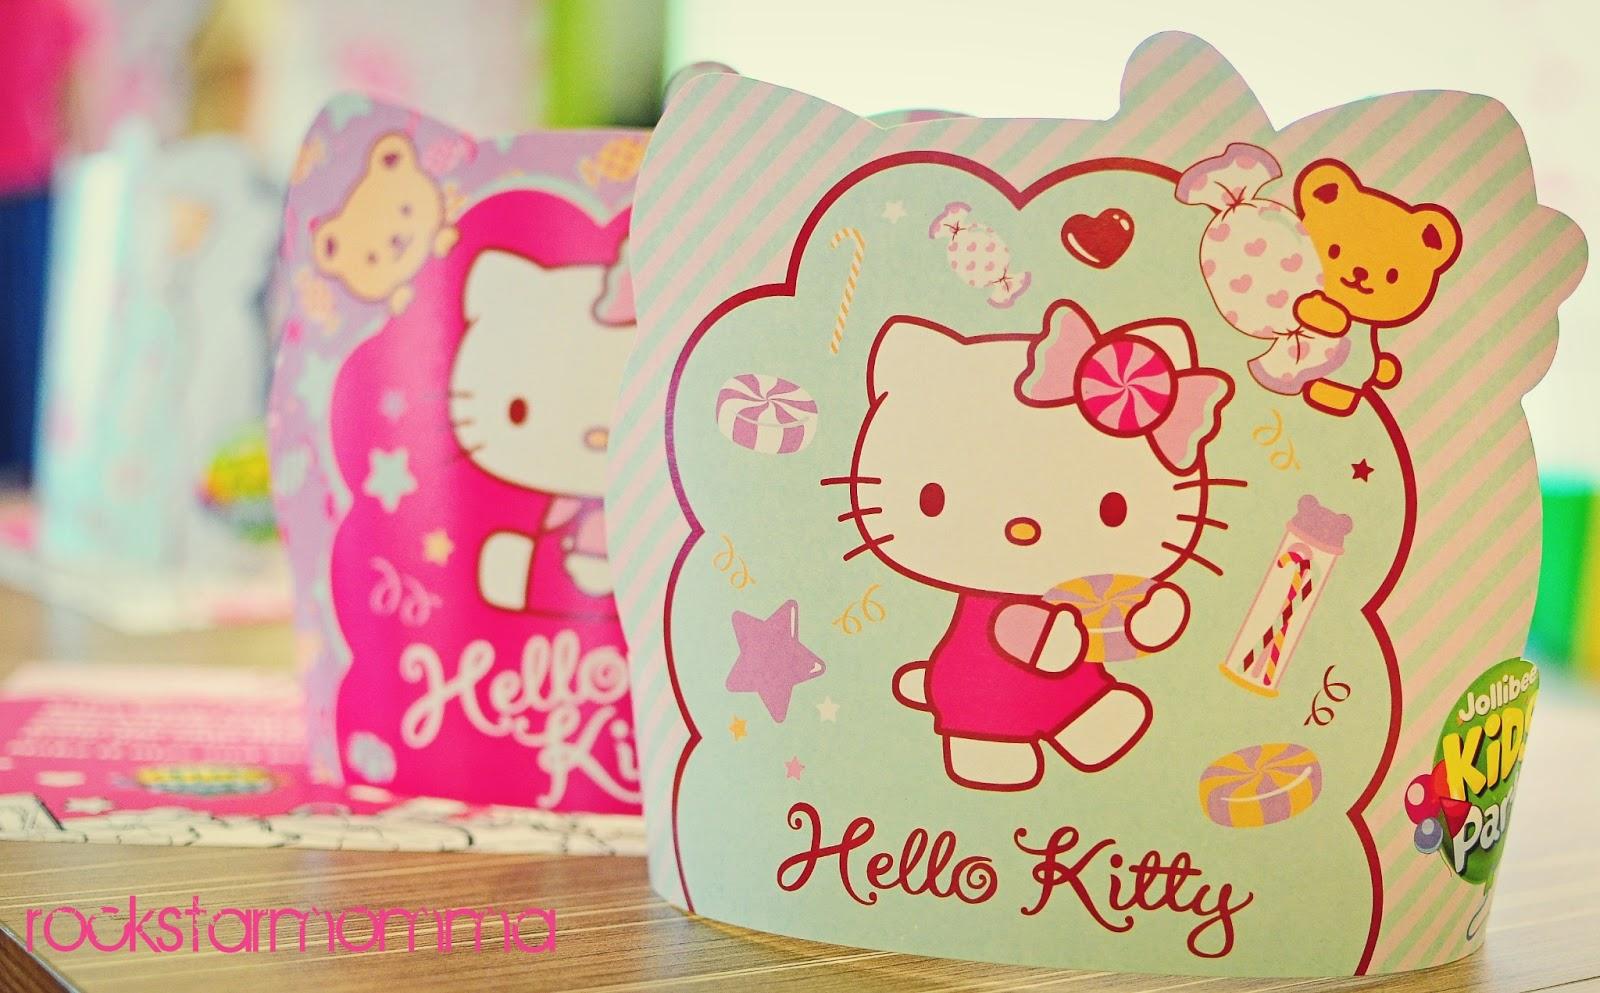 521cca31da Celebrate a Purr-fect Hello Kitty Birthday with Jollibee Kids Party ...